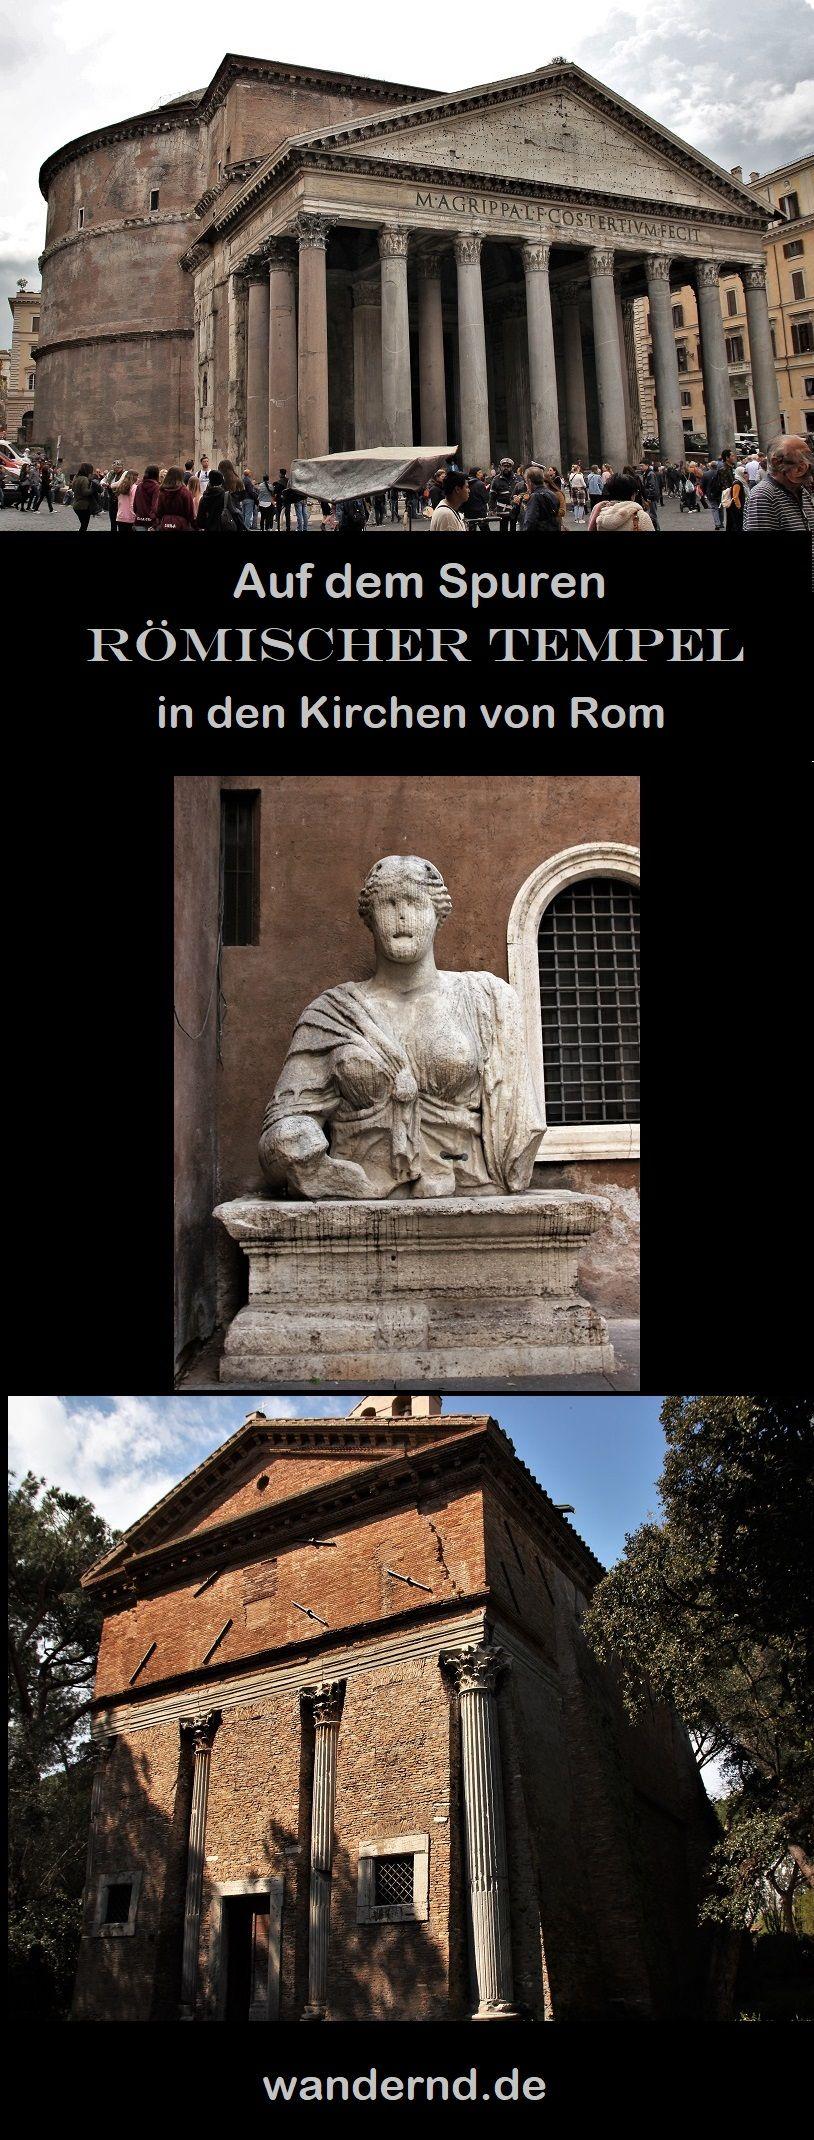 Romische Tempel Spuren Der Antike In Den Kirchen Roms Rom Reisen Italien Urlaub